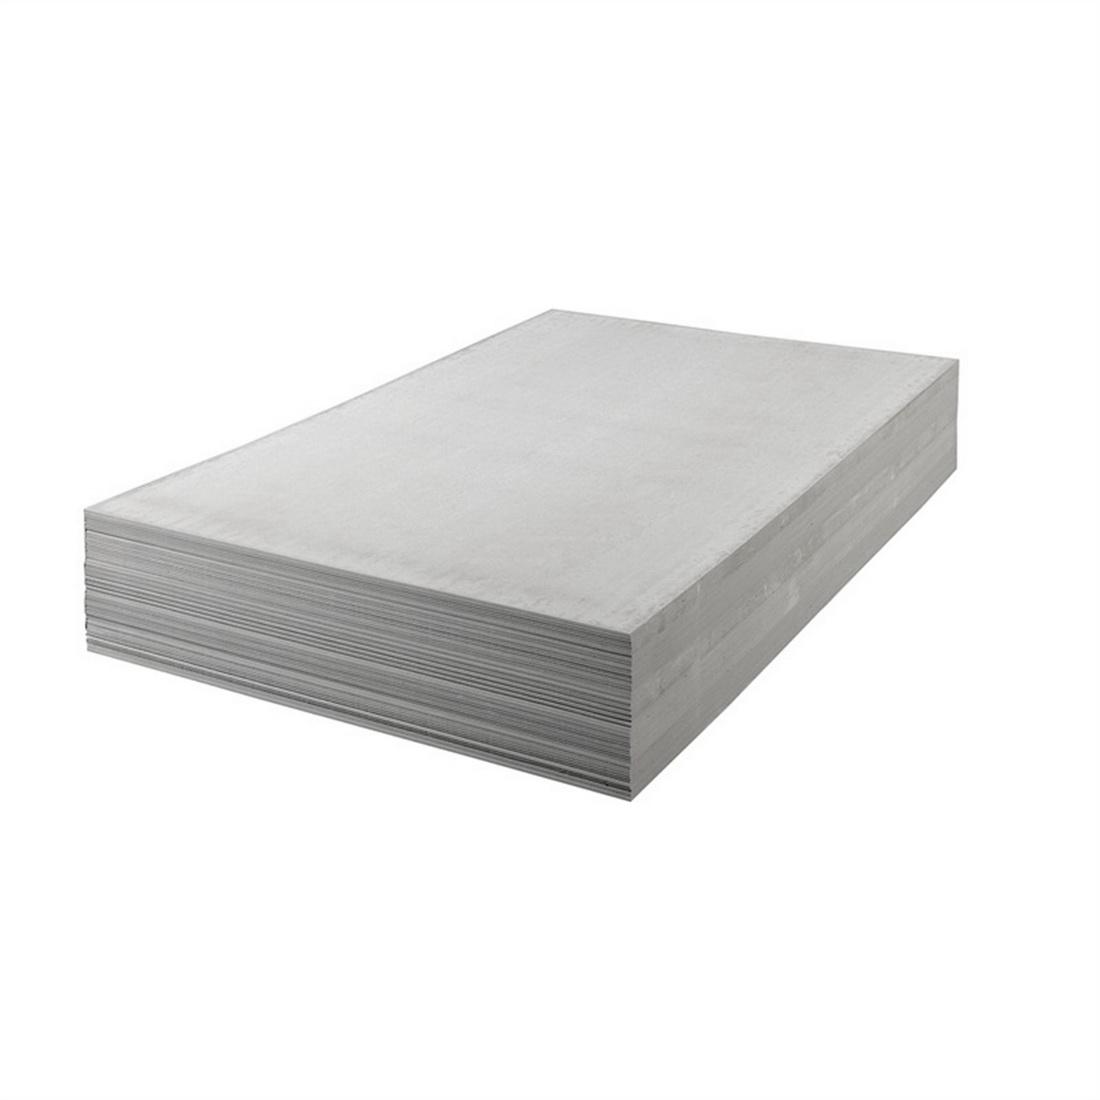 HardieFlex Sheet 3000 x 1200 x 7.5mm